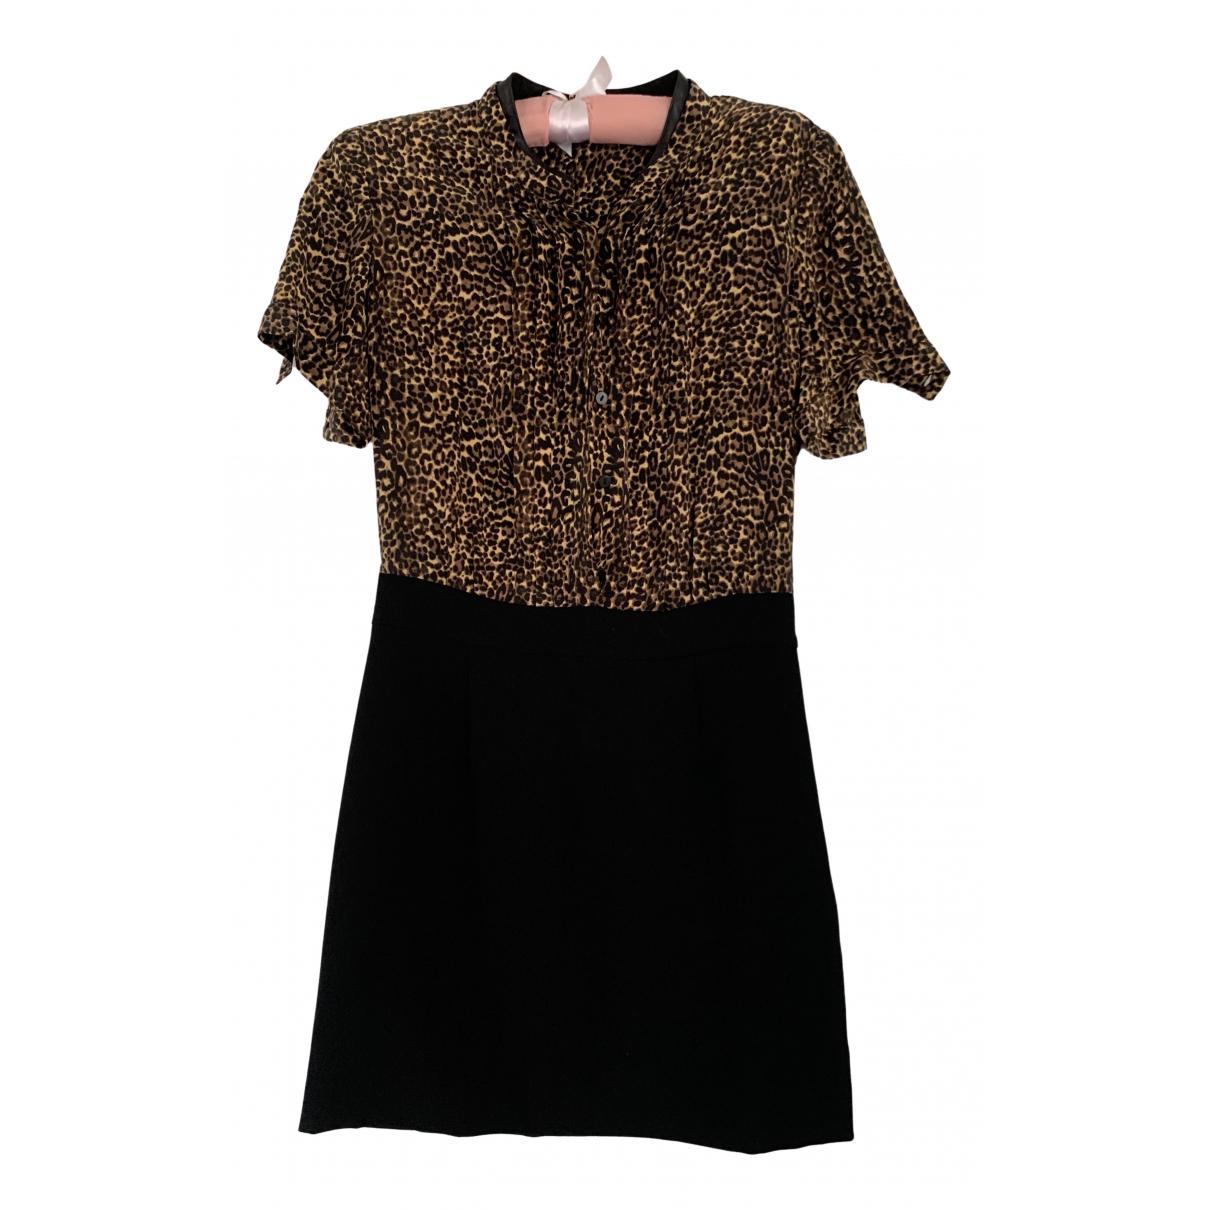 The Kooples N Black dress for Women 36 FR